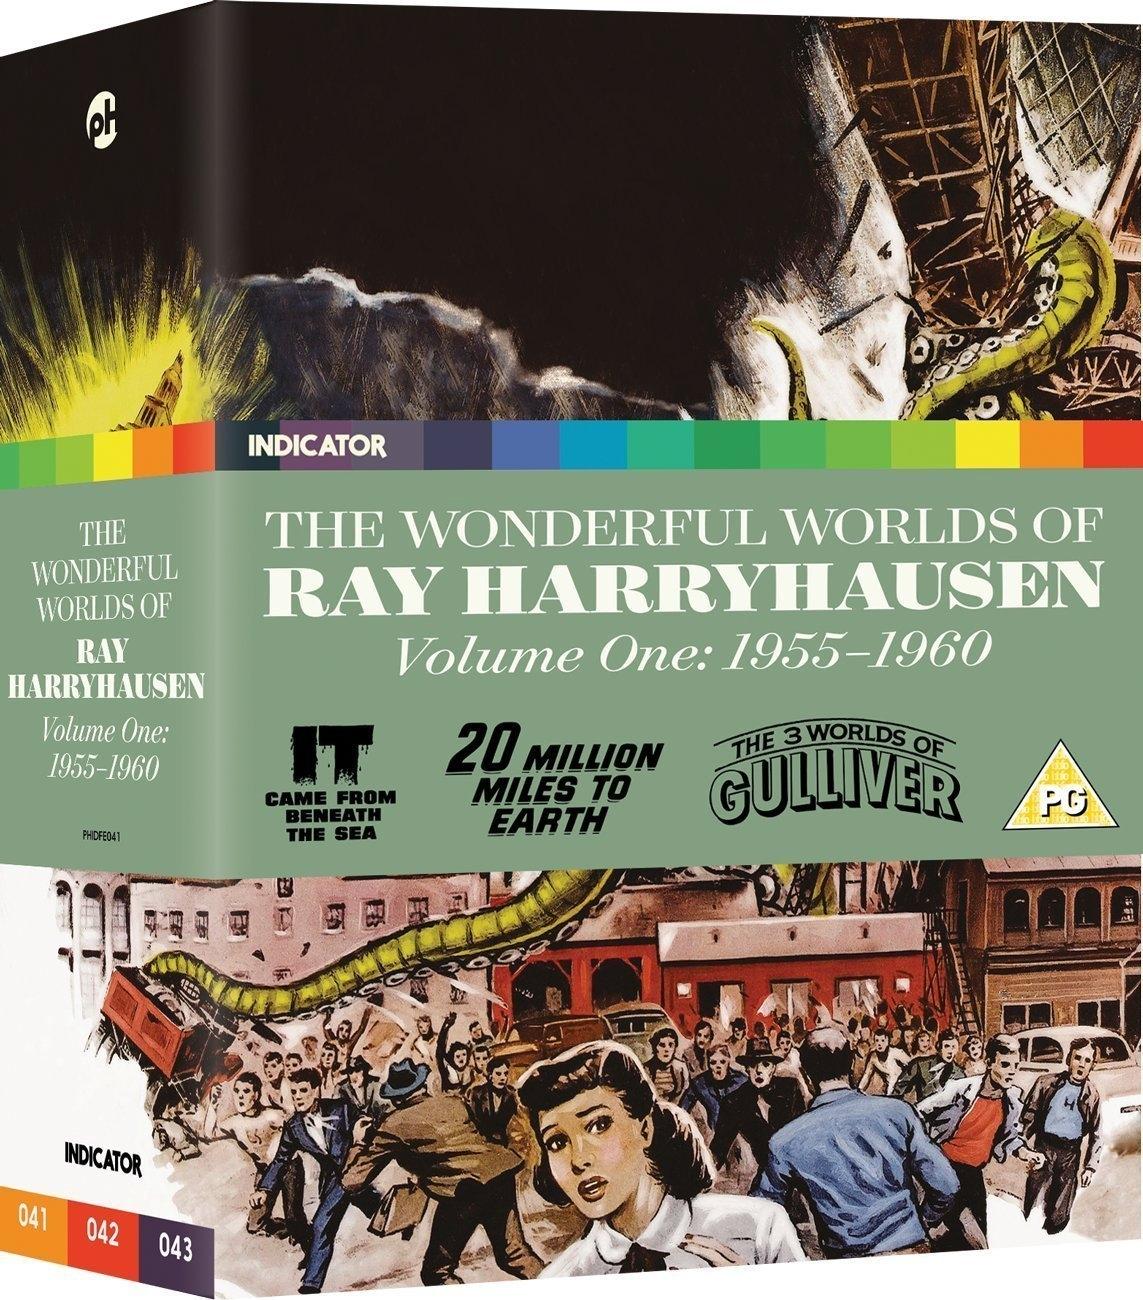 Buy The Wonderful Worlds of Ray Harryhausen: Volume One - 1955-1960